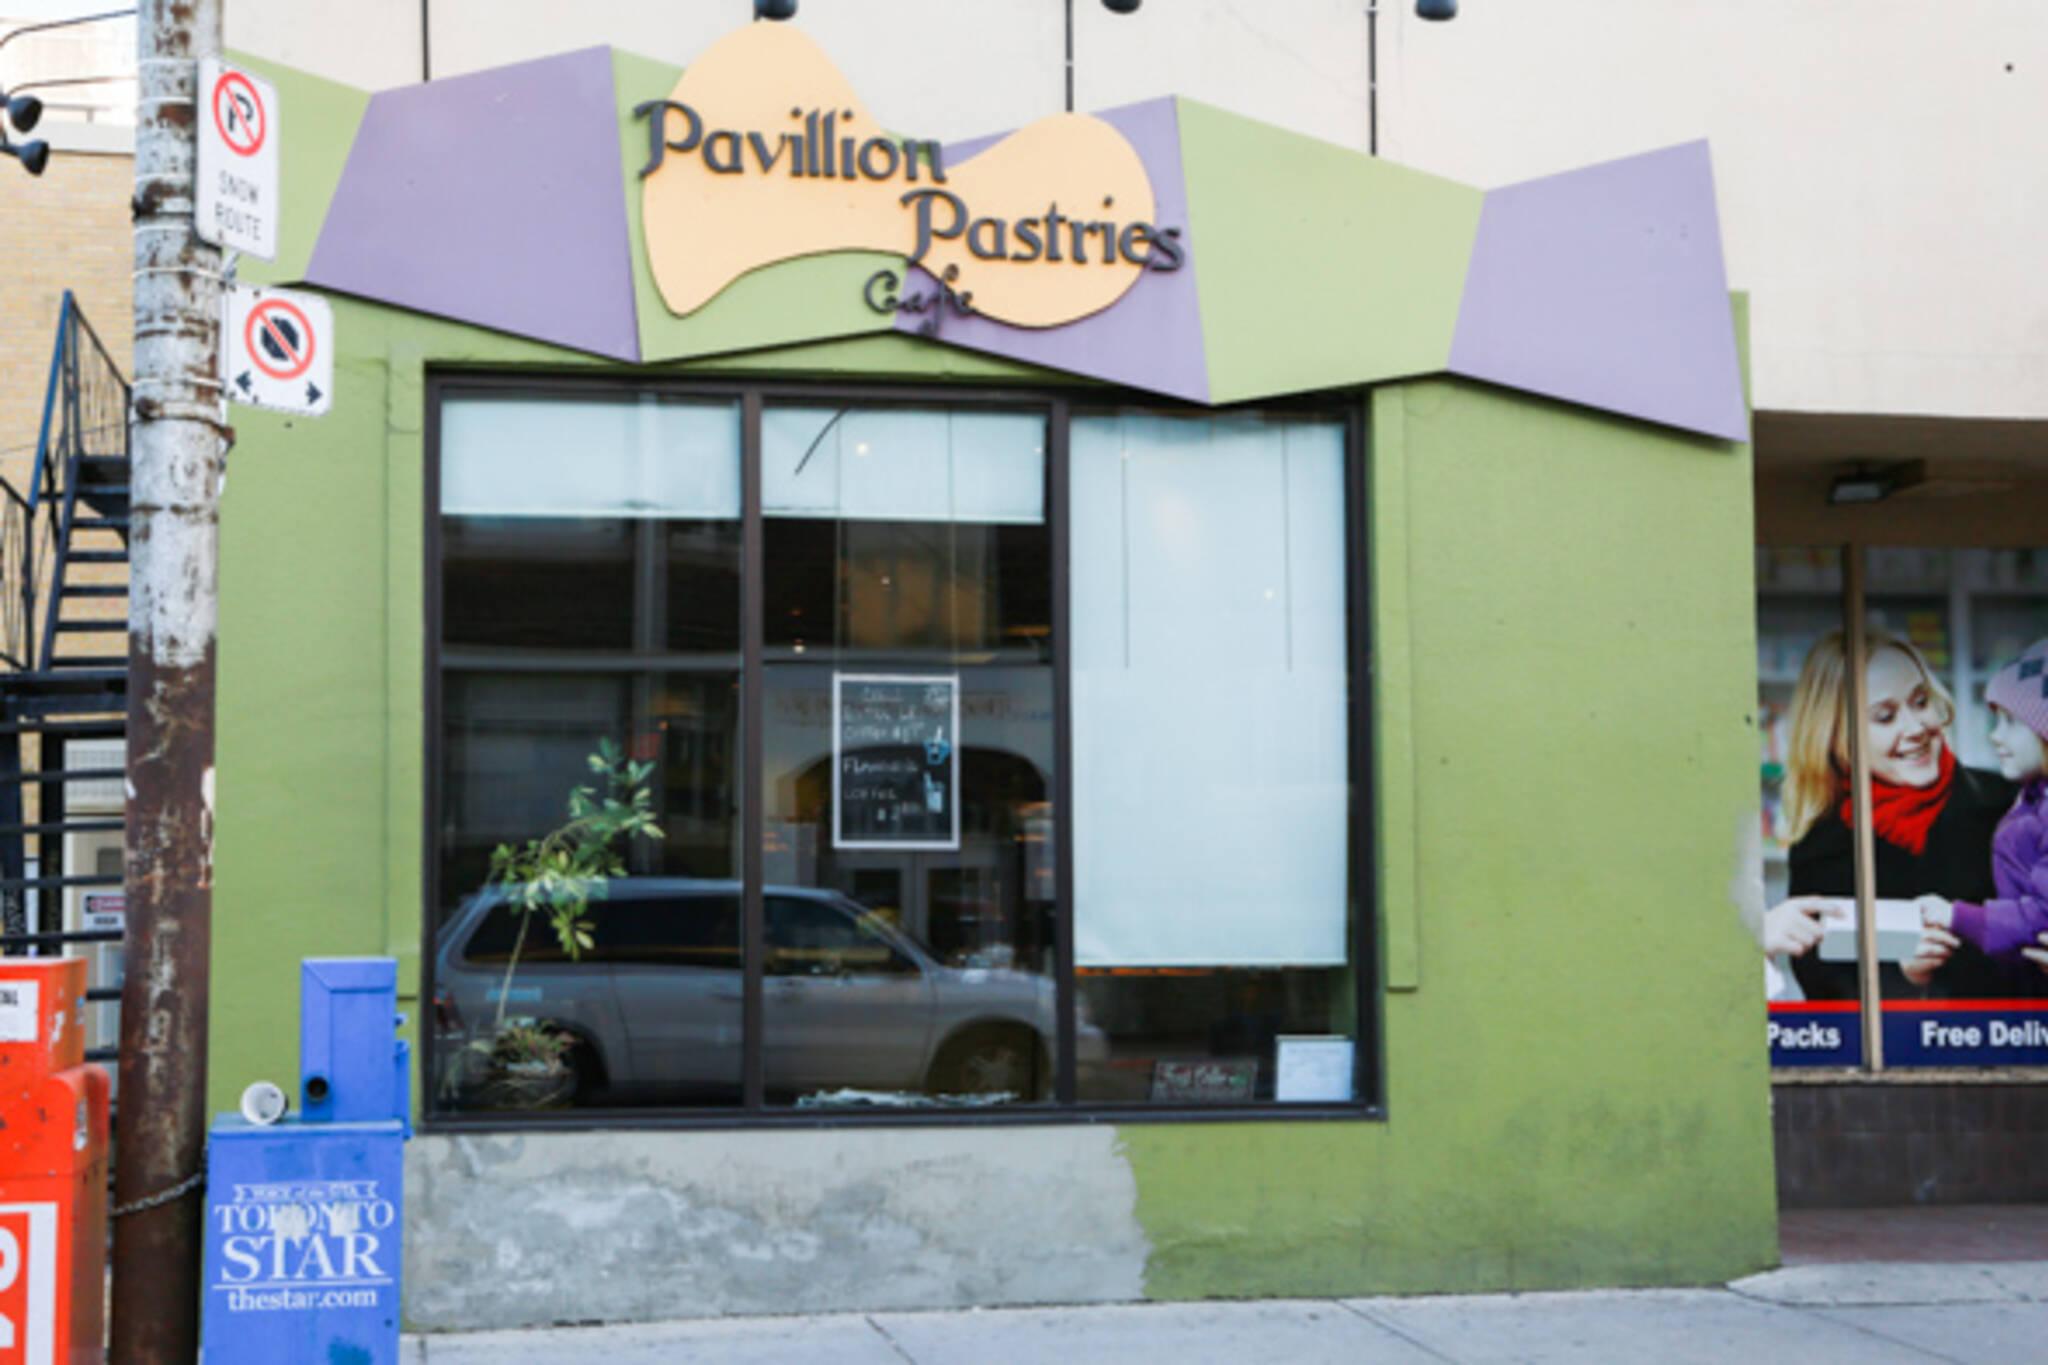 pavillion pastries